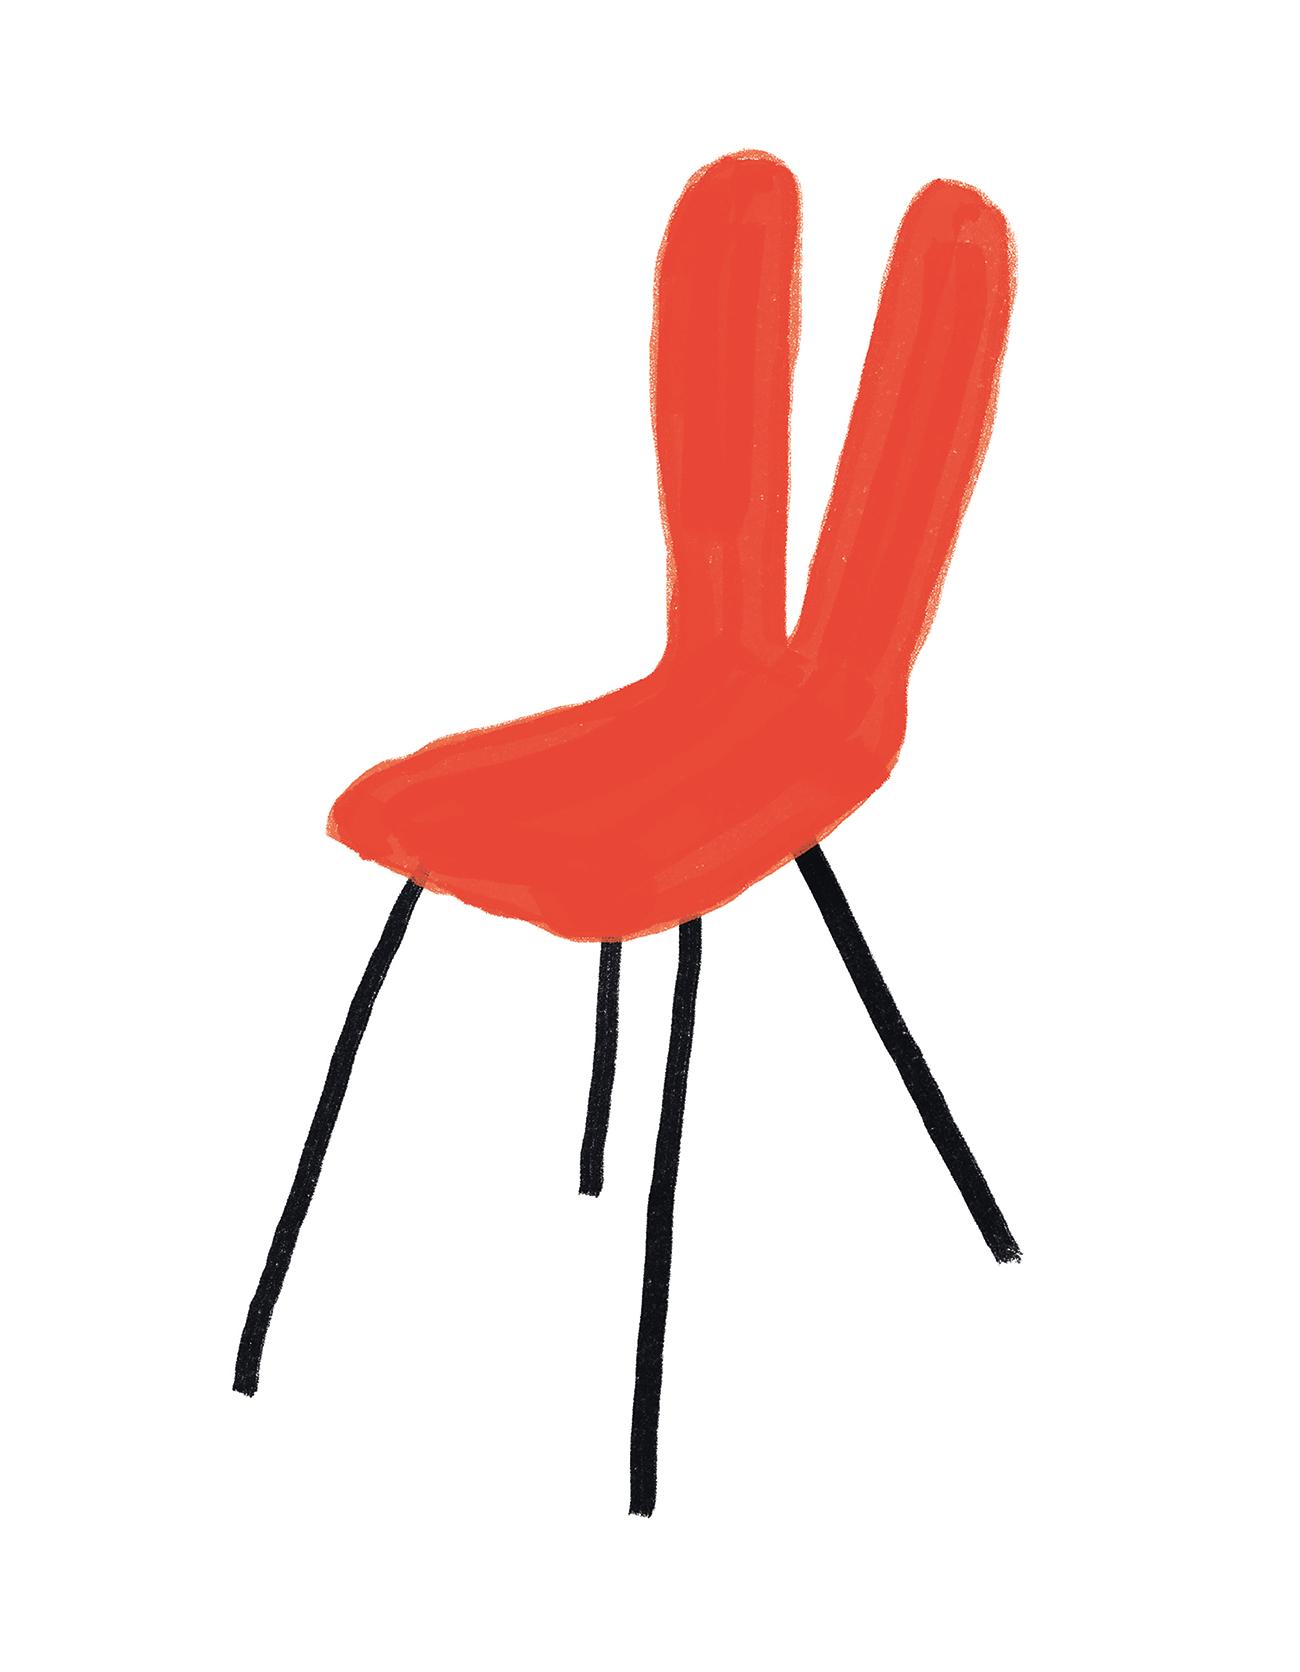 interior-design-women-feminist-chair-obect-Kazuyo-Sejima-chair-illustration-violeta-noy